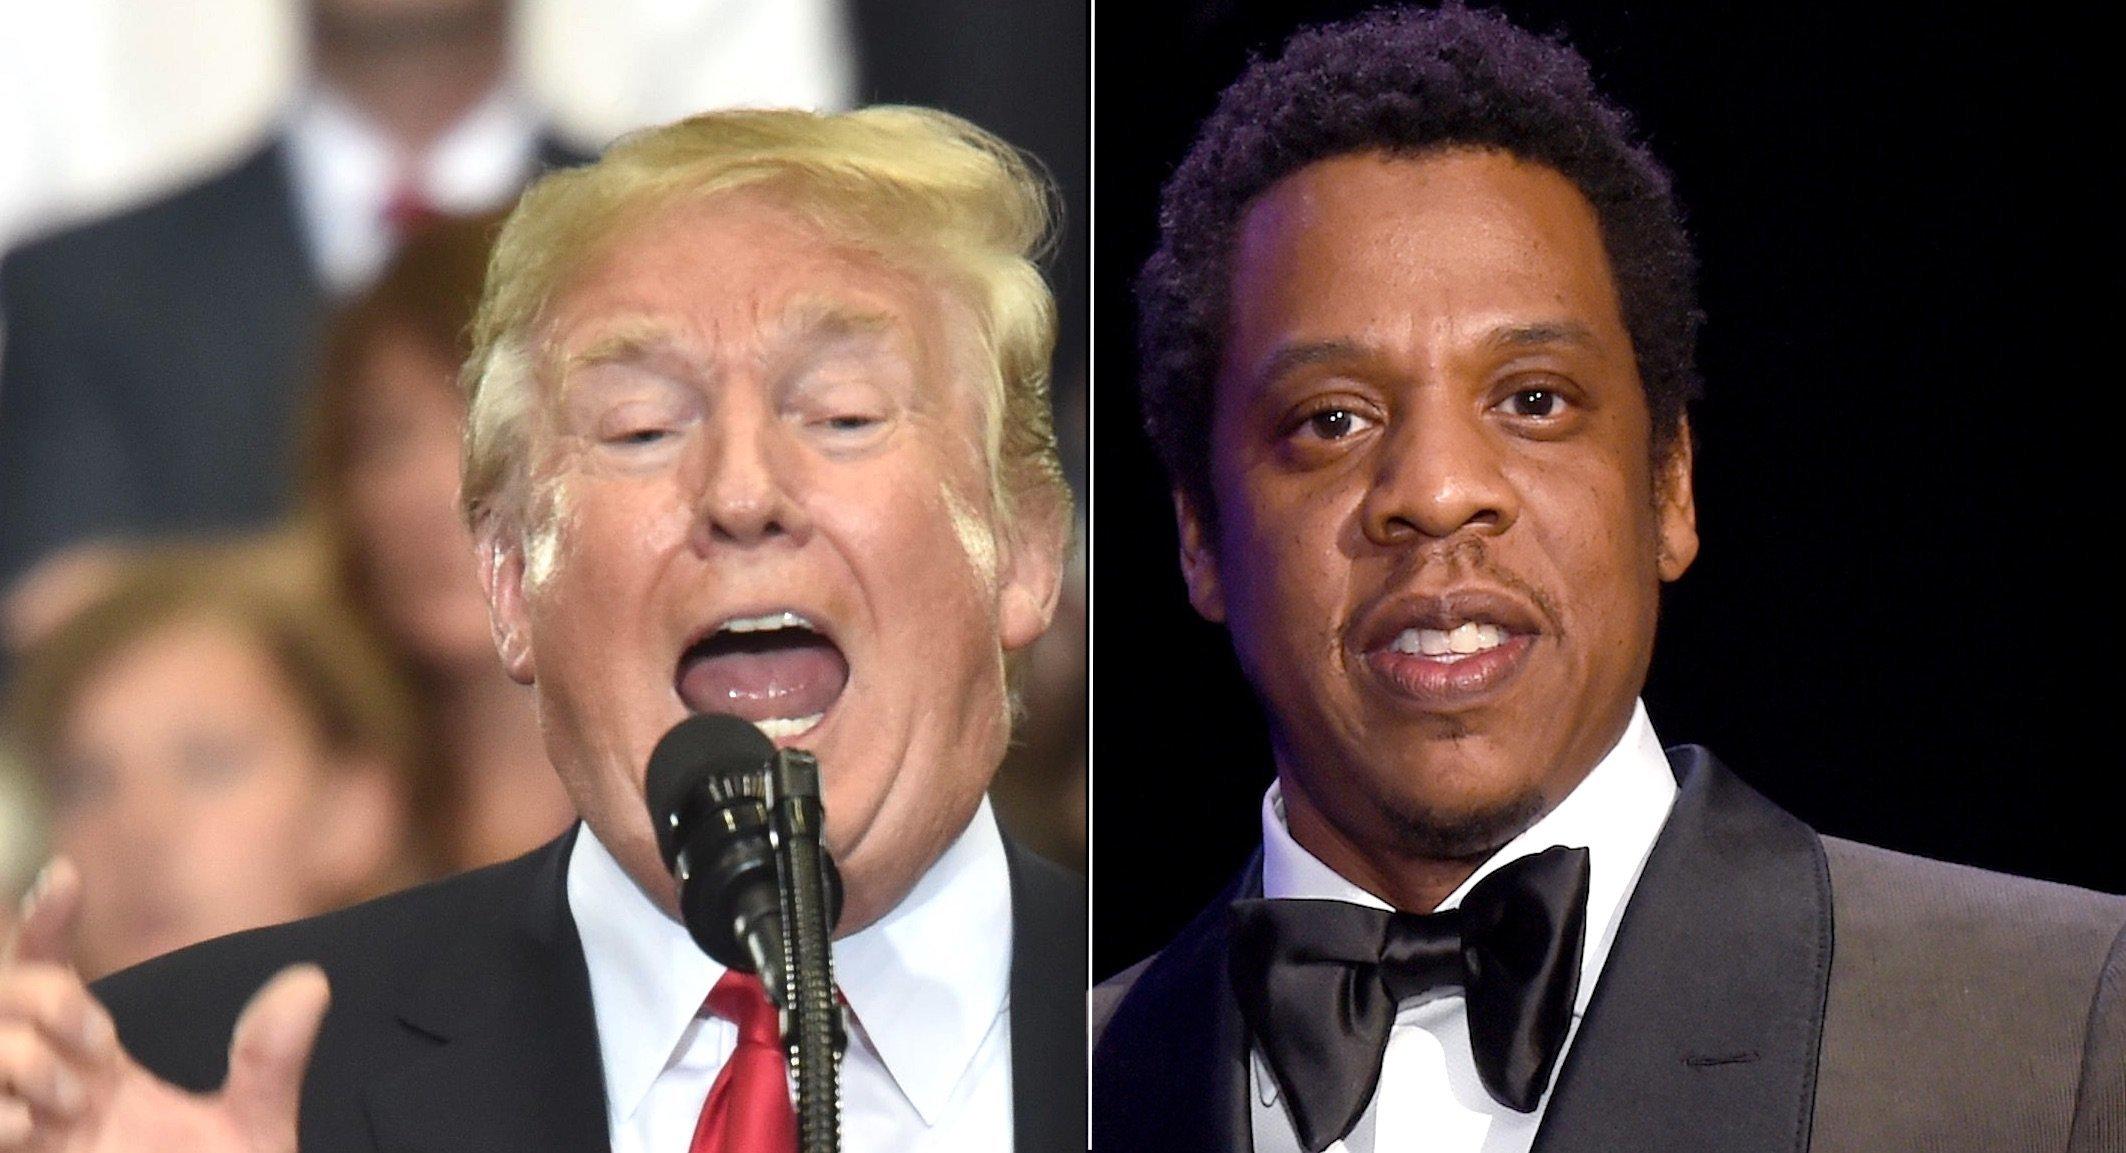 Trump Jay-Z